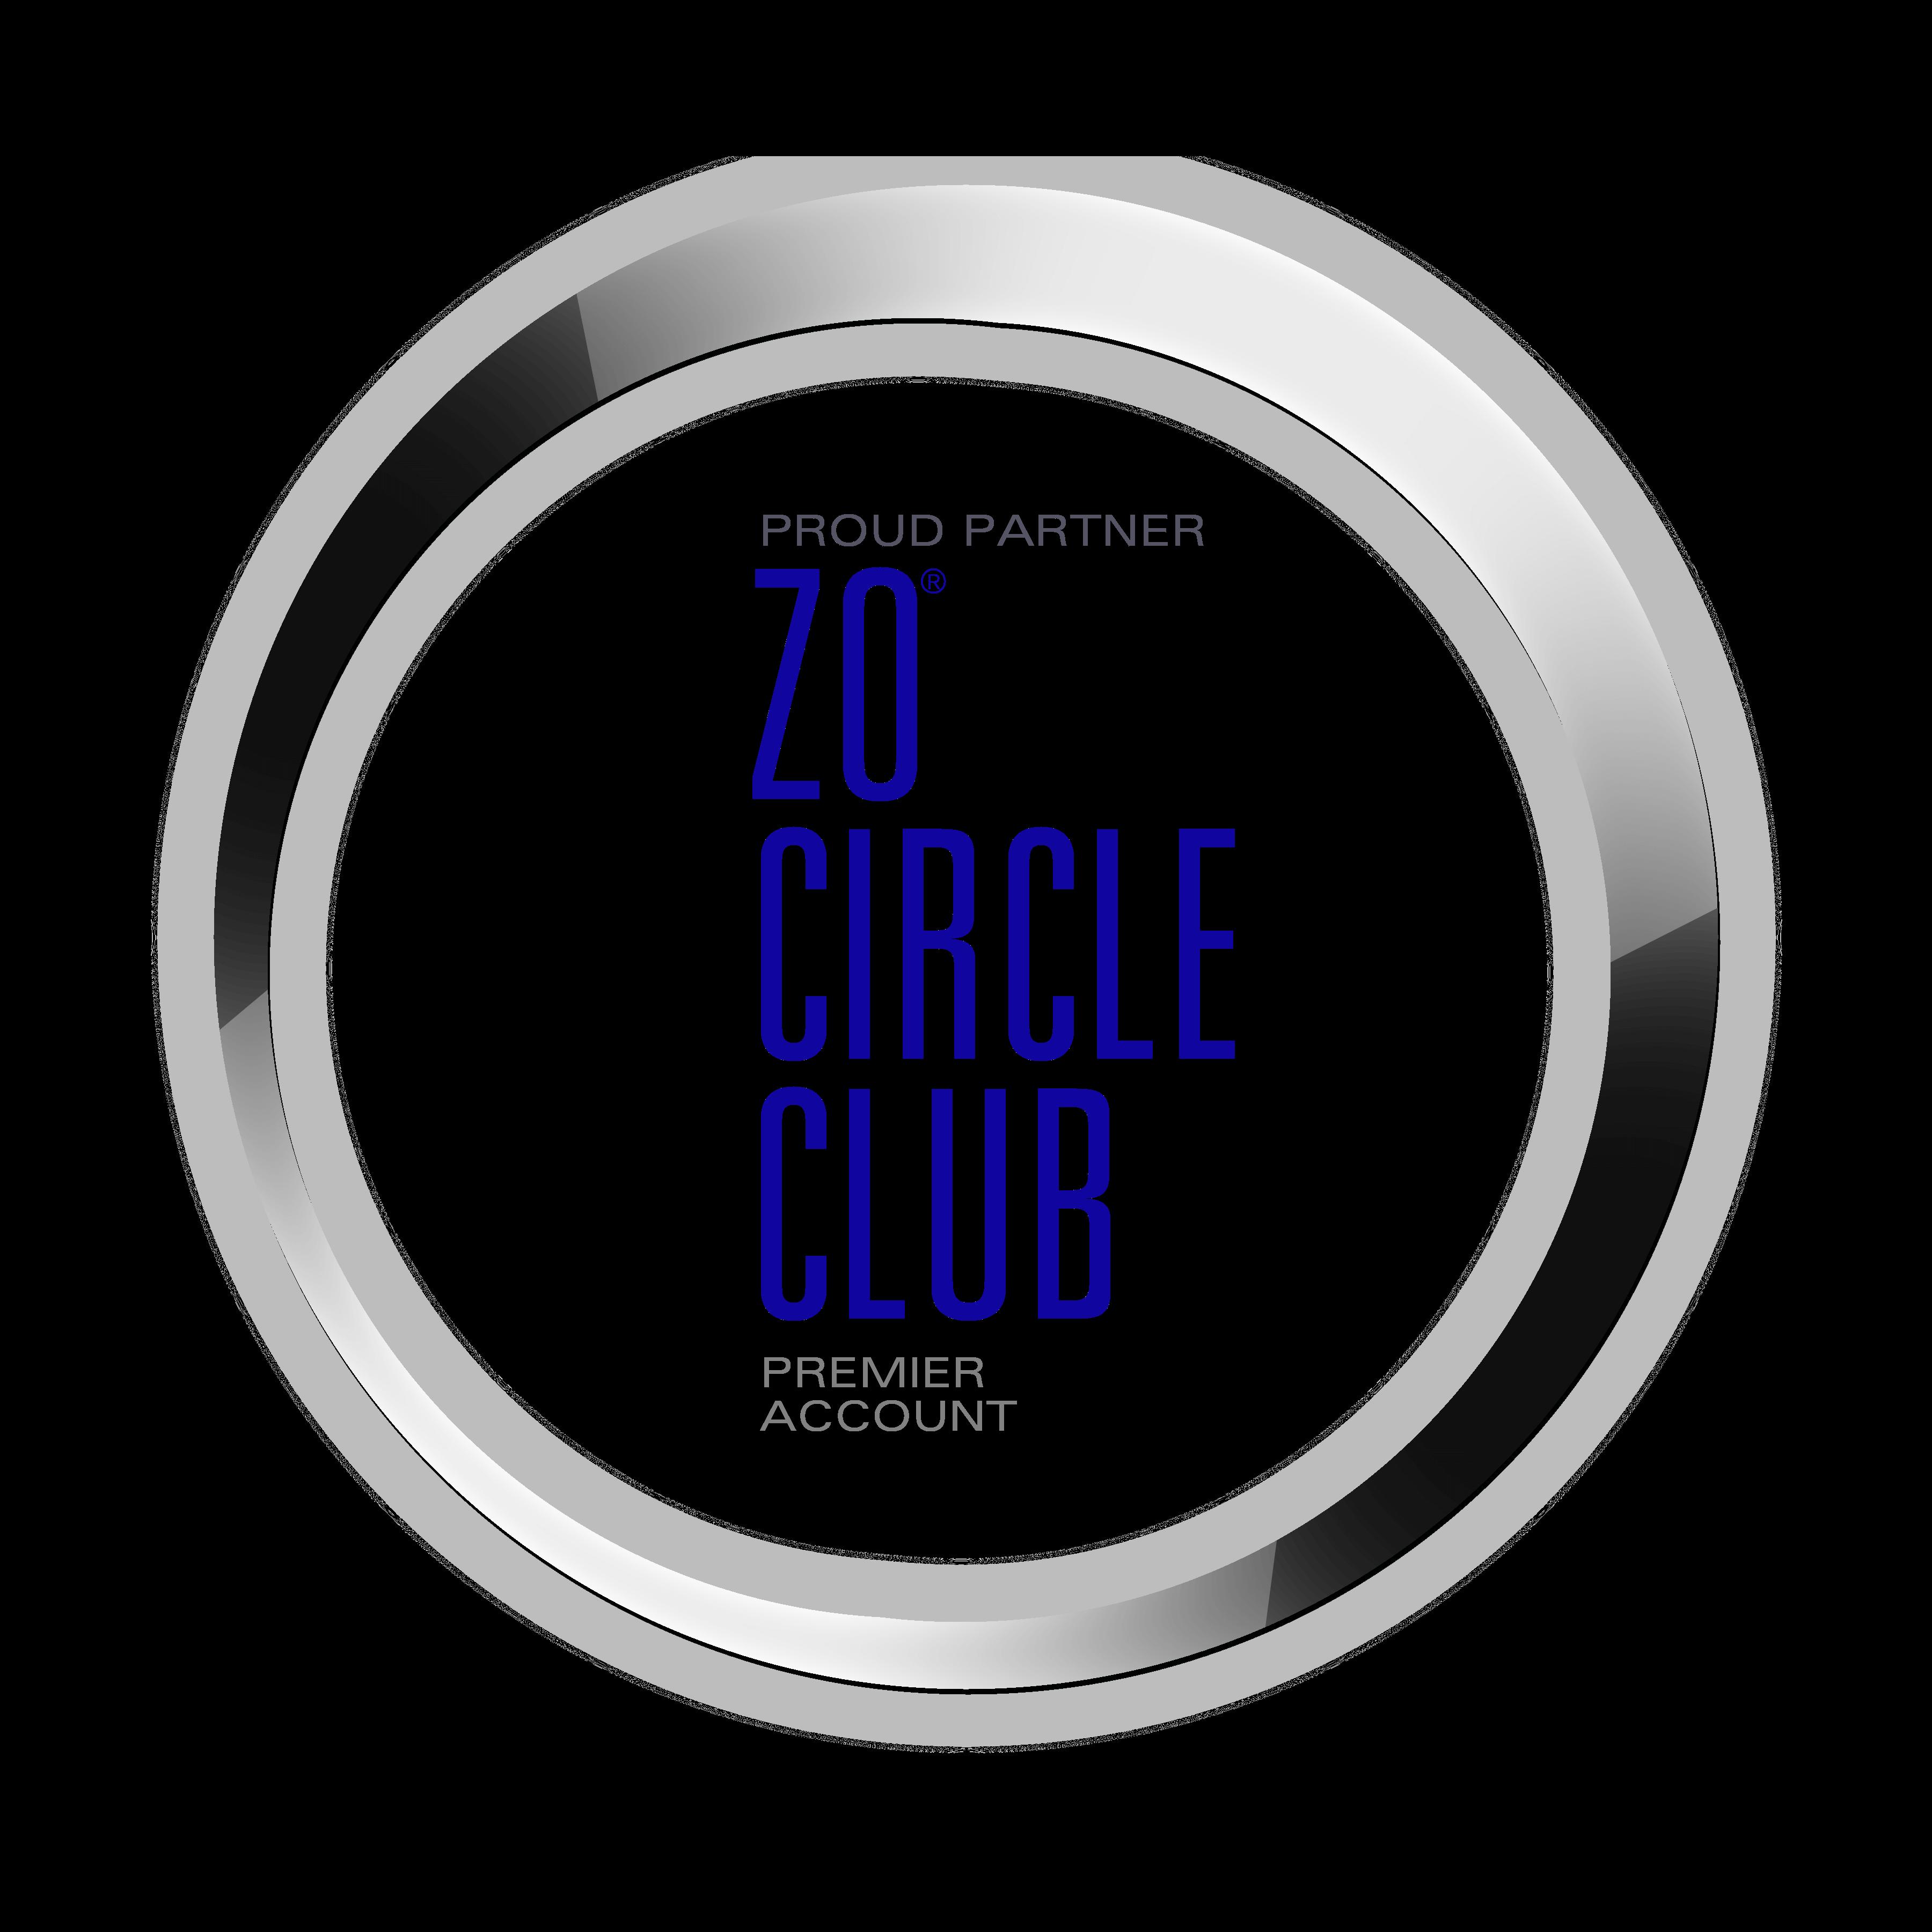 ZO Circle Club Premier Account